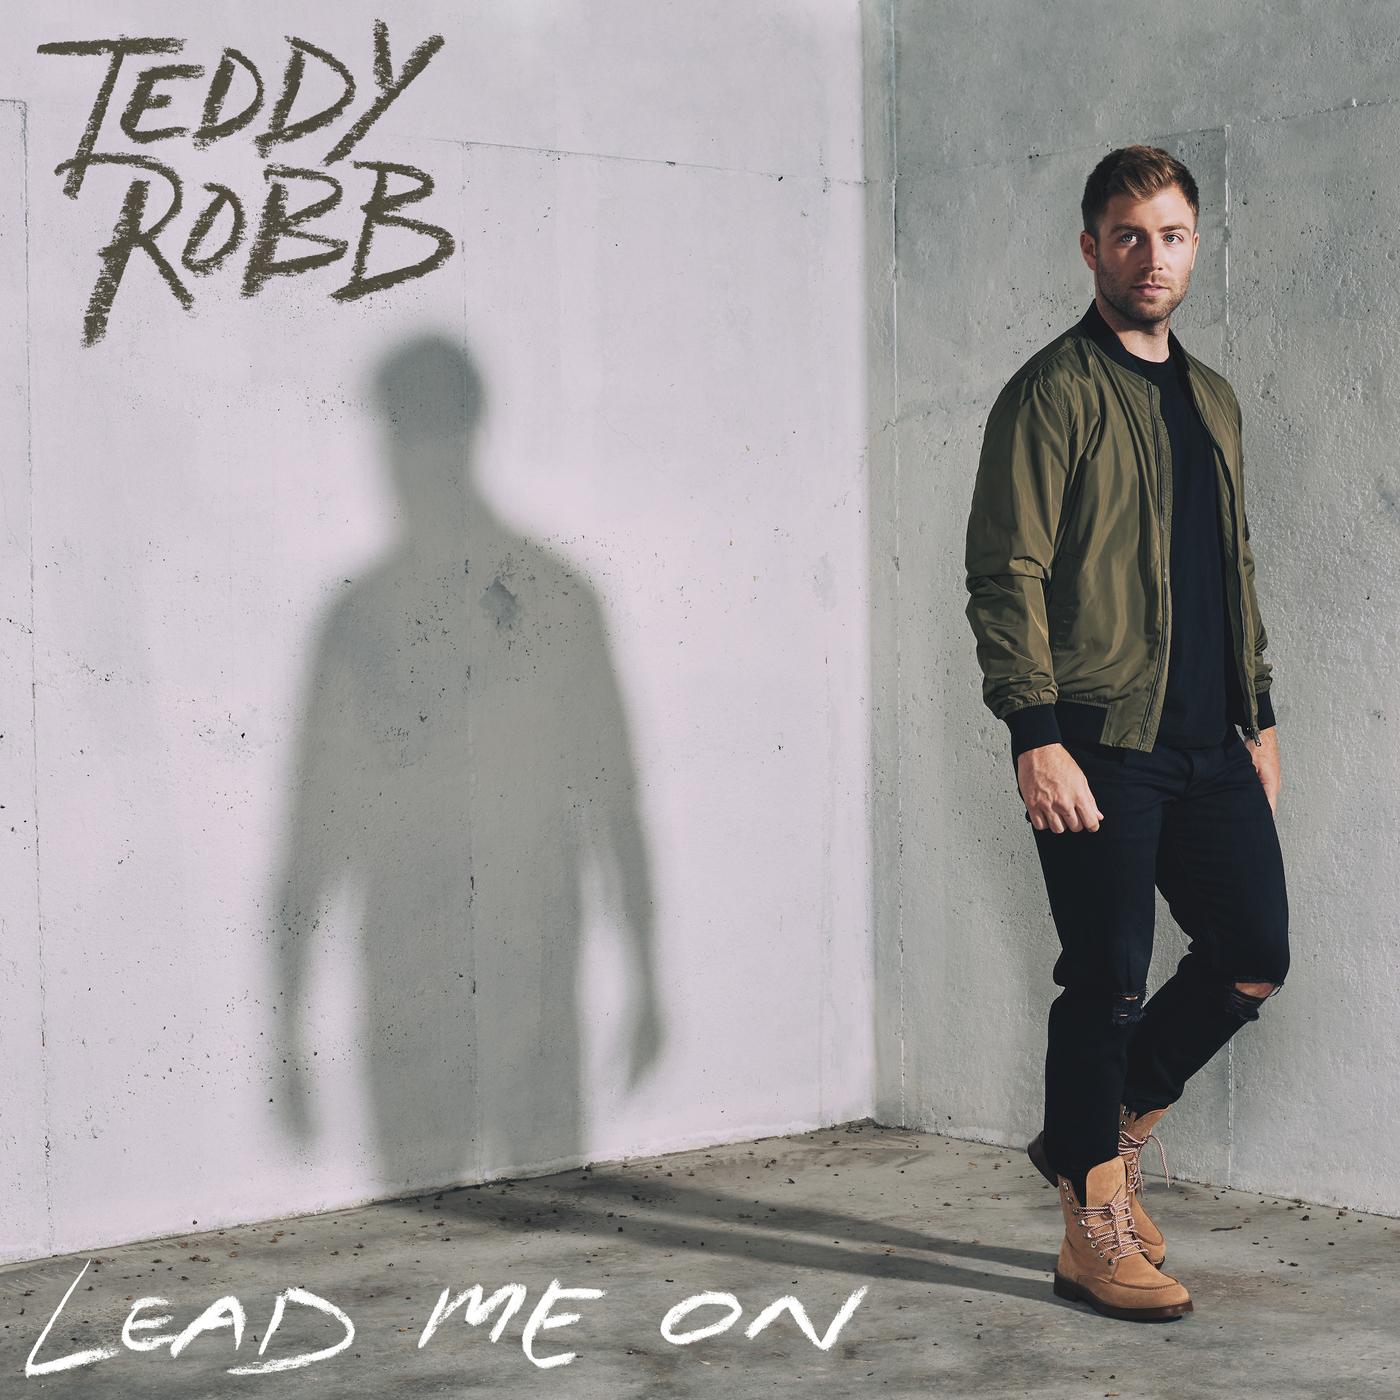 Lead Me On - Teddy Robb